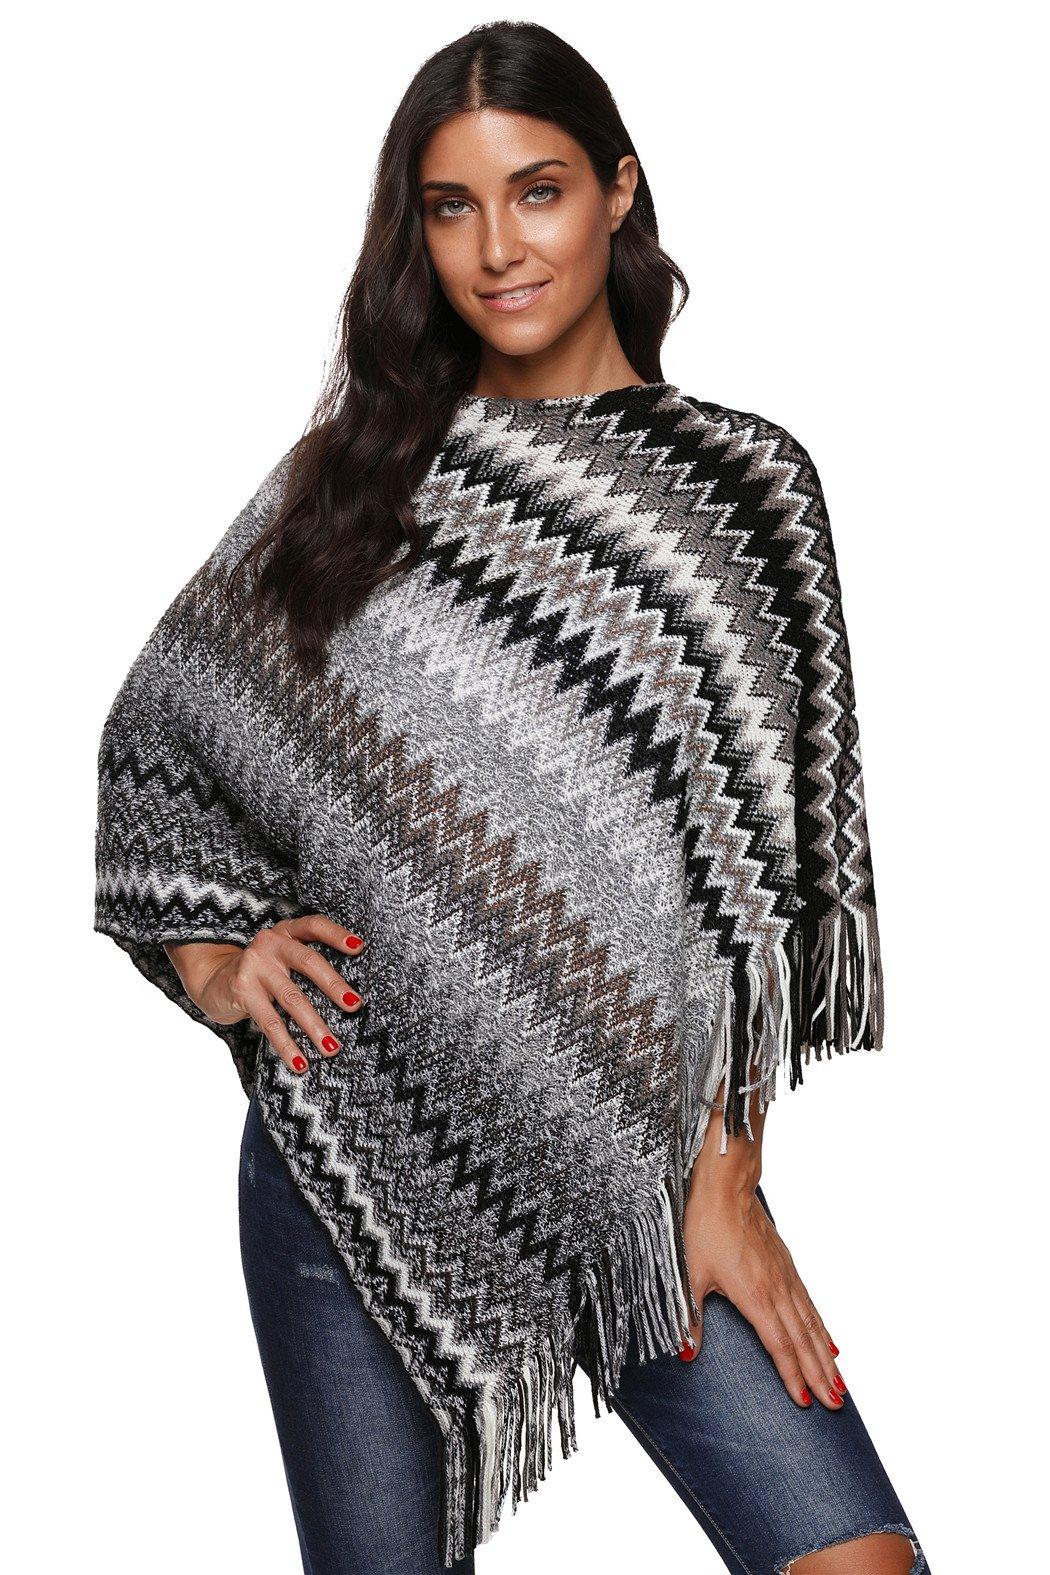 Knitting Skirt Pattern - Browse Patterns